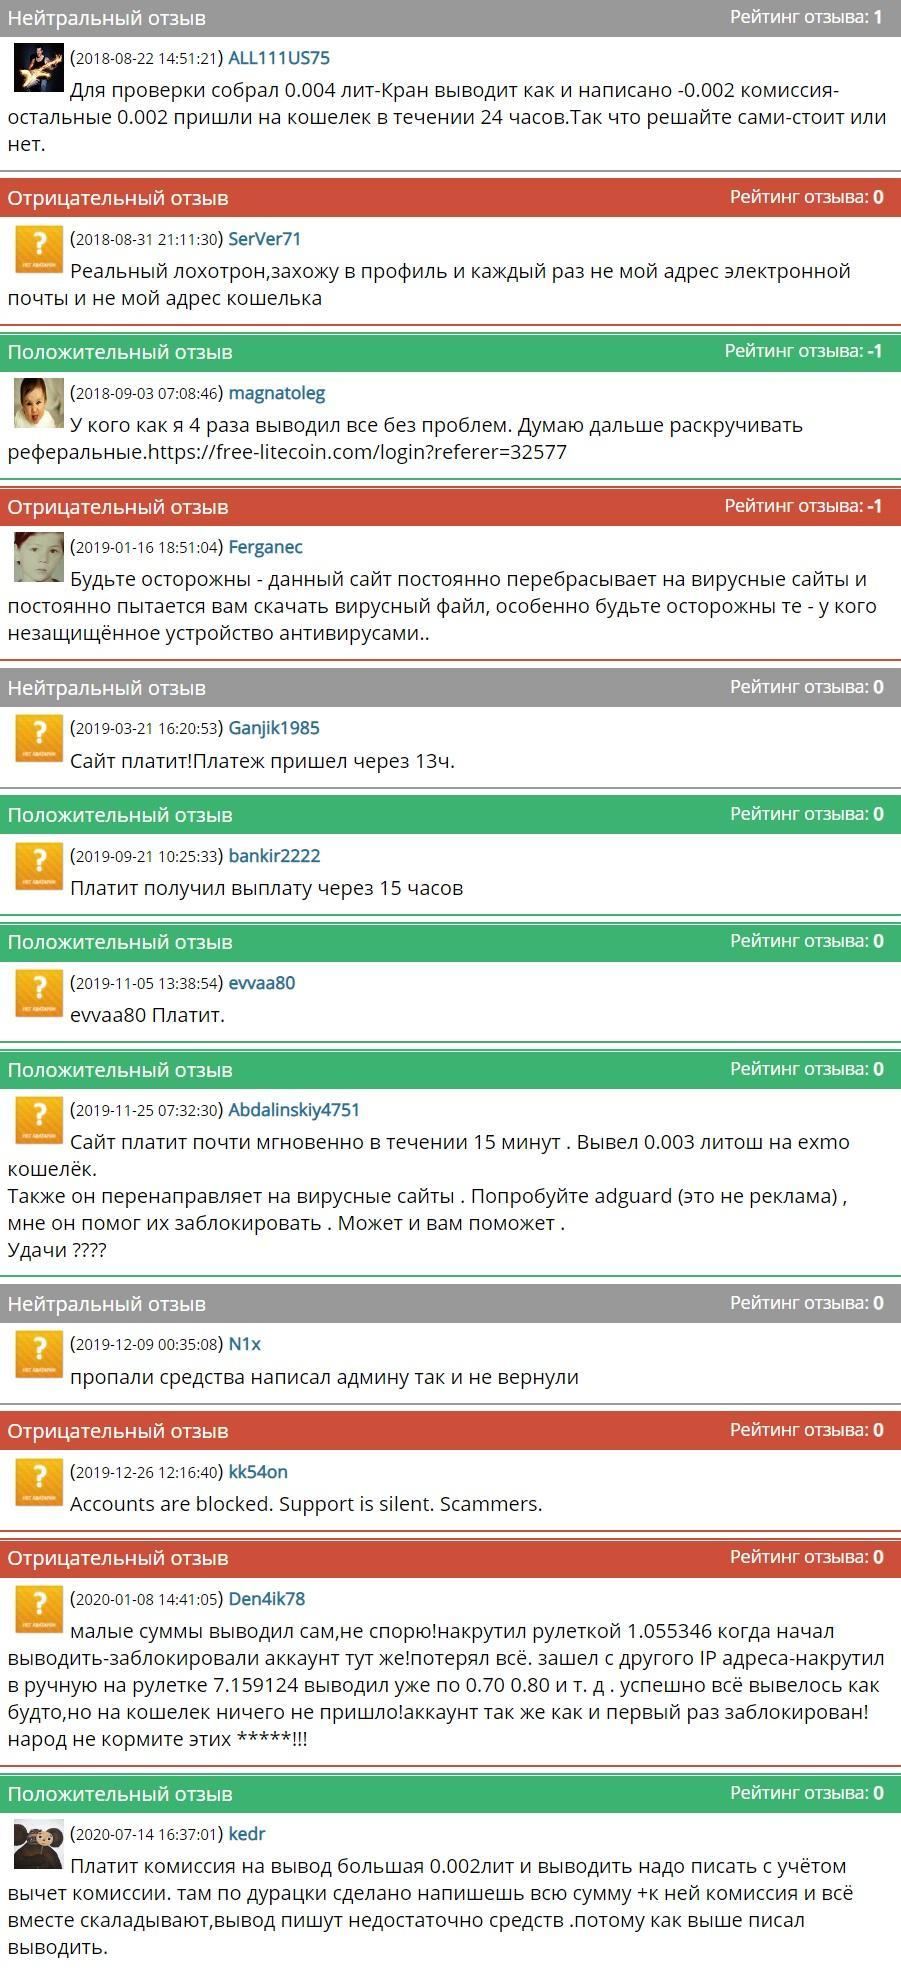 отзывы о кране free-litecoin